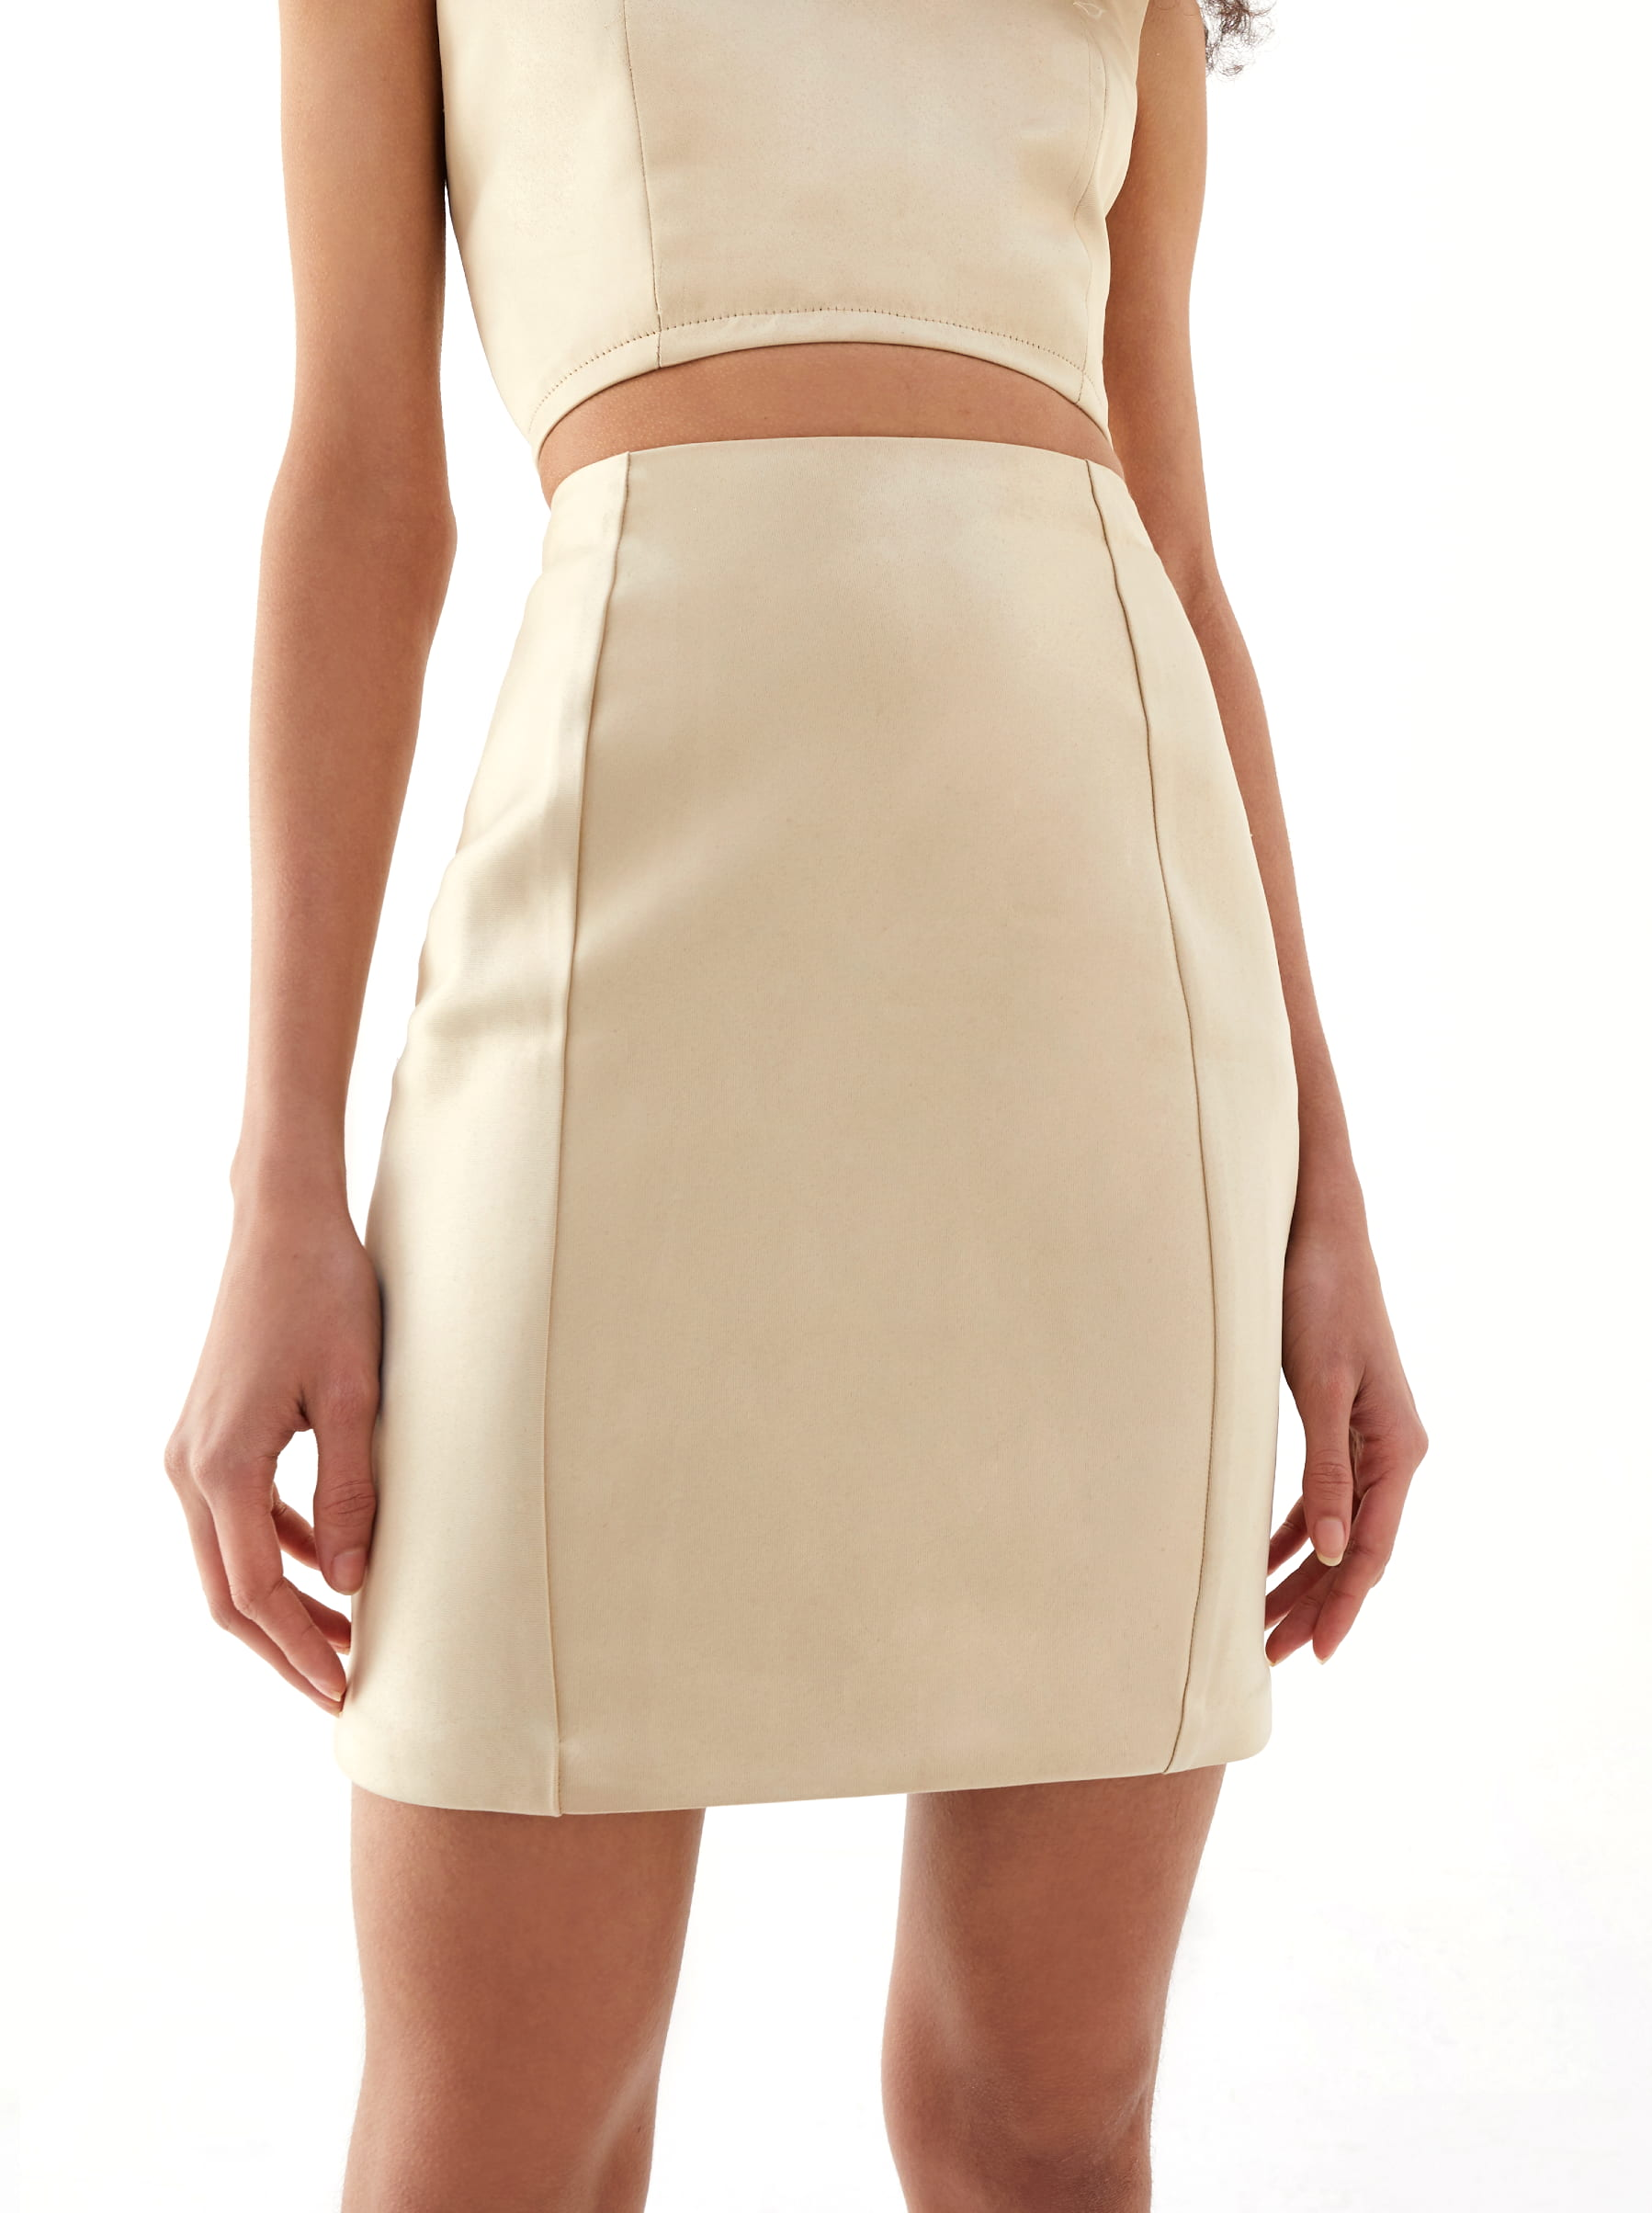 Kismah Skirt